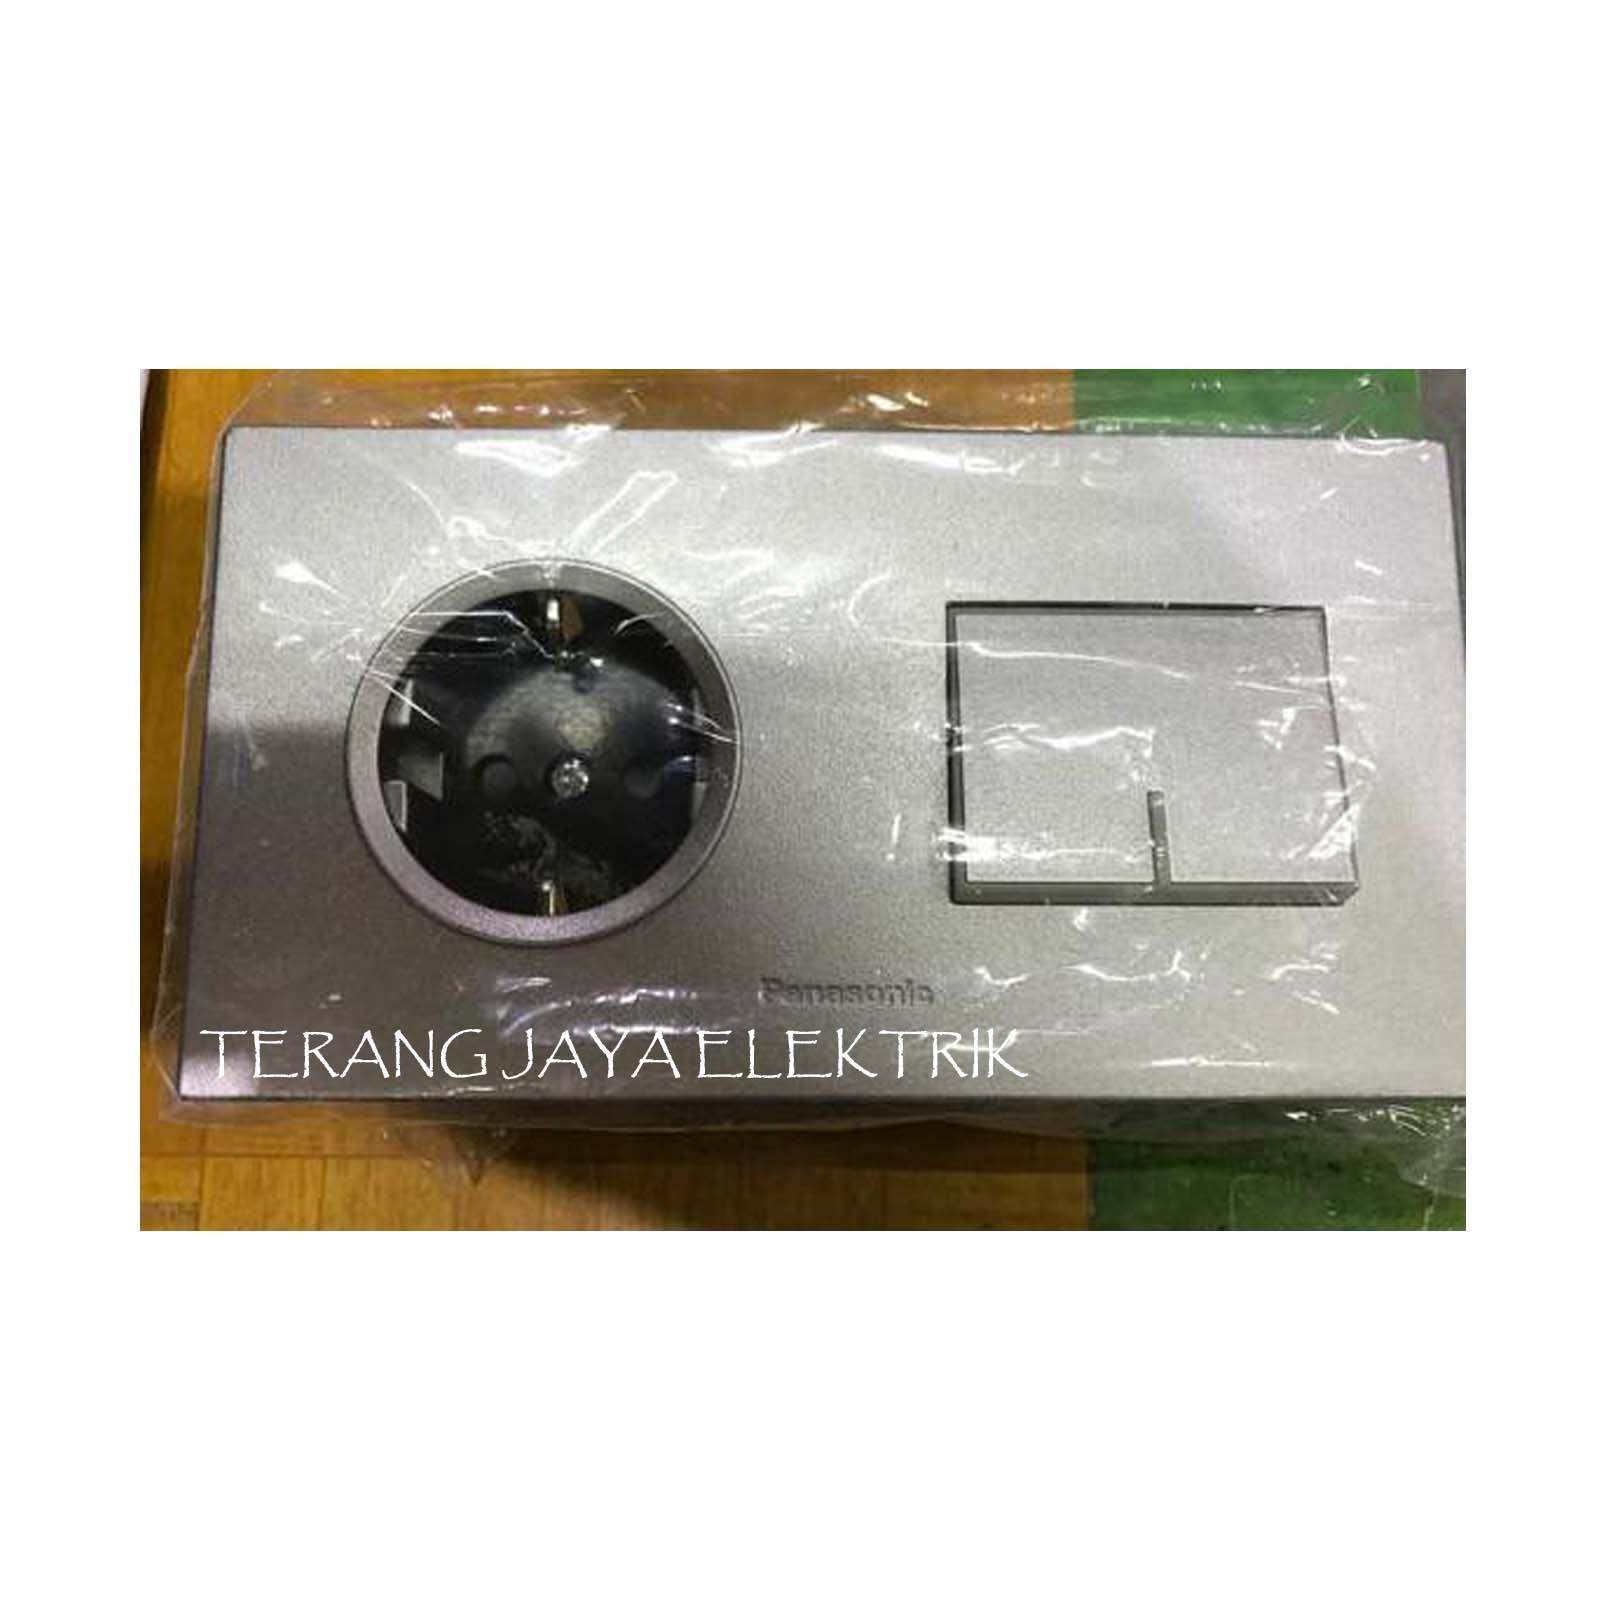 Stop Kontak dan Saklar Engkel Besar WESJ5941MWS dan WESJP11212MWS Panasonic Silver Style E